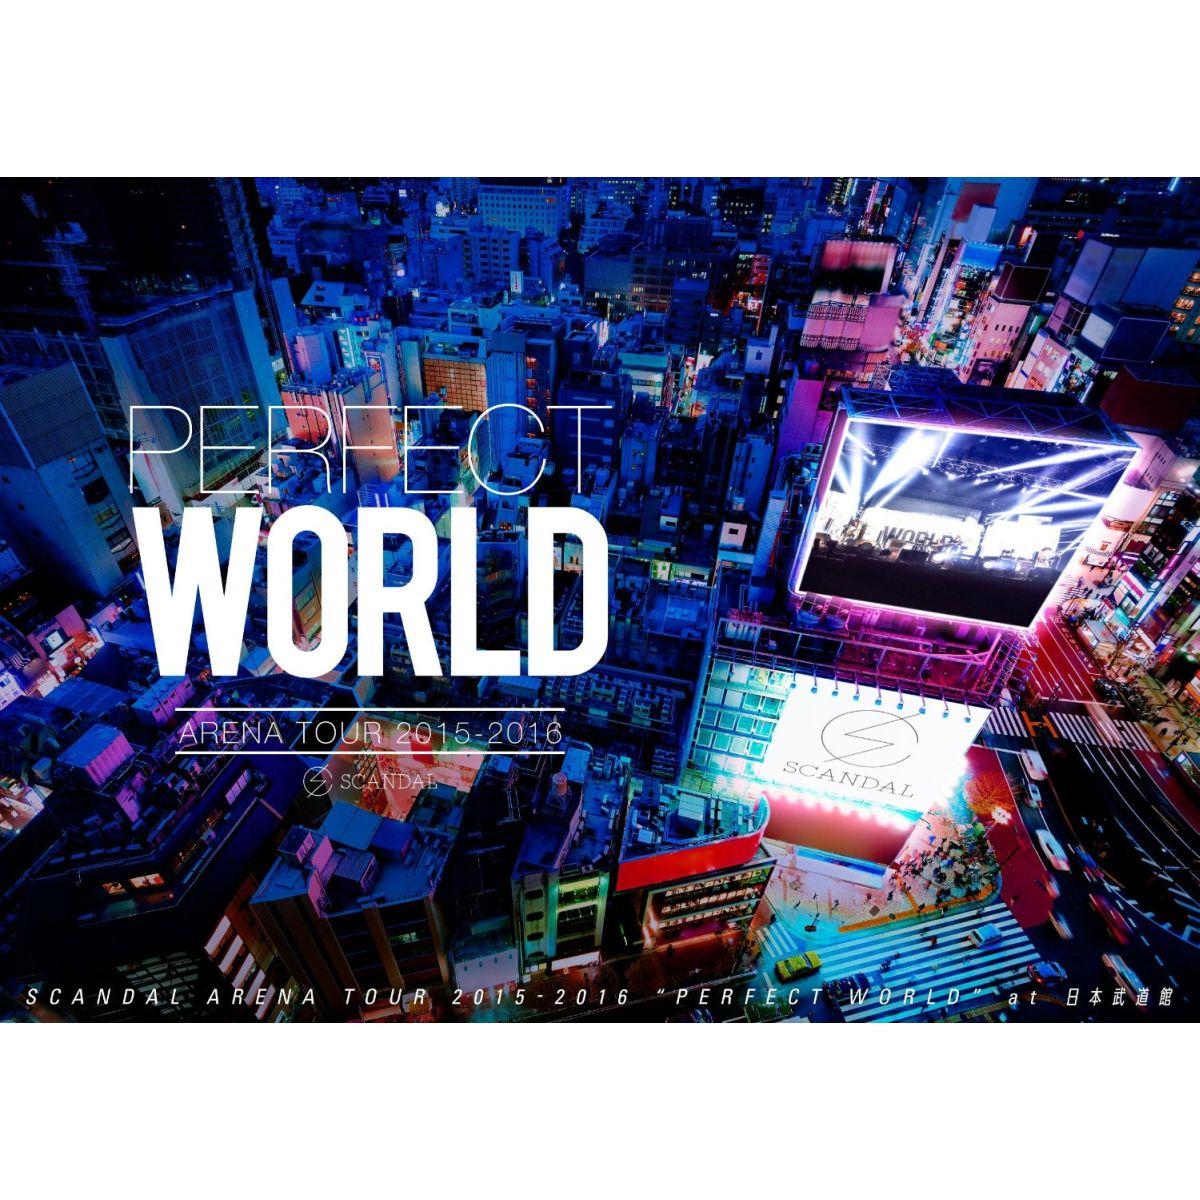 SCANDAL ARENA TOUR 2015-2016 「PERFECT WORLD」画像